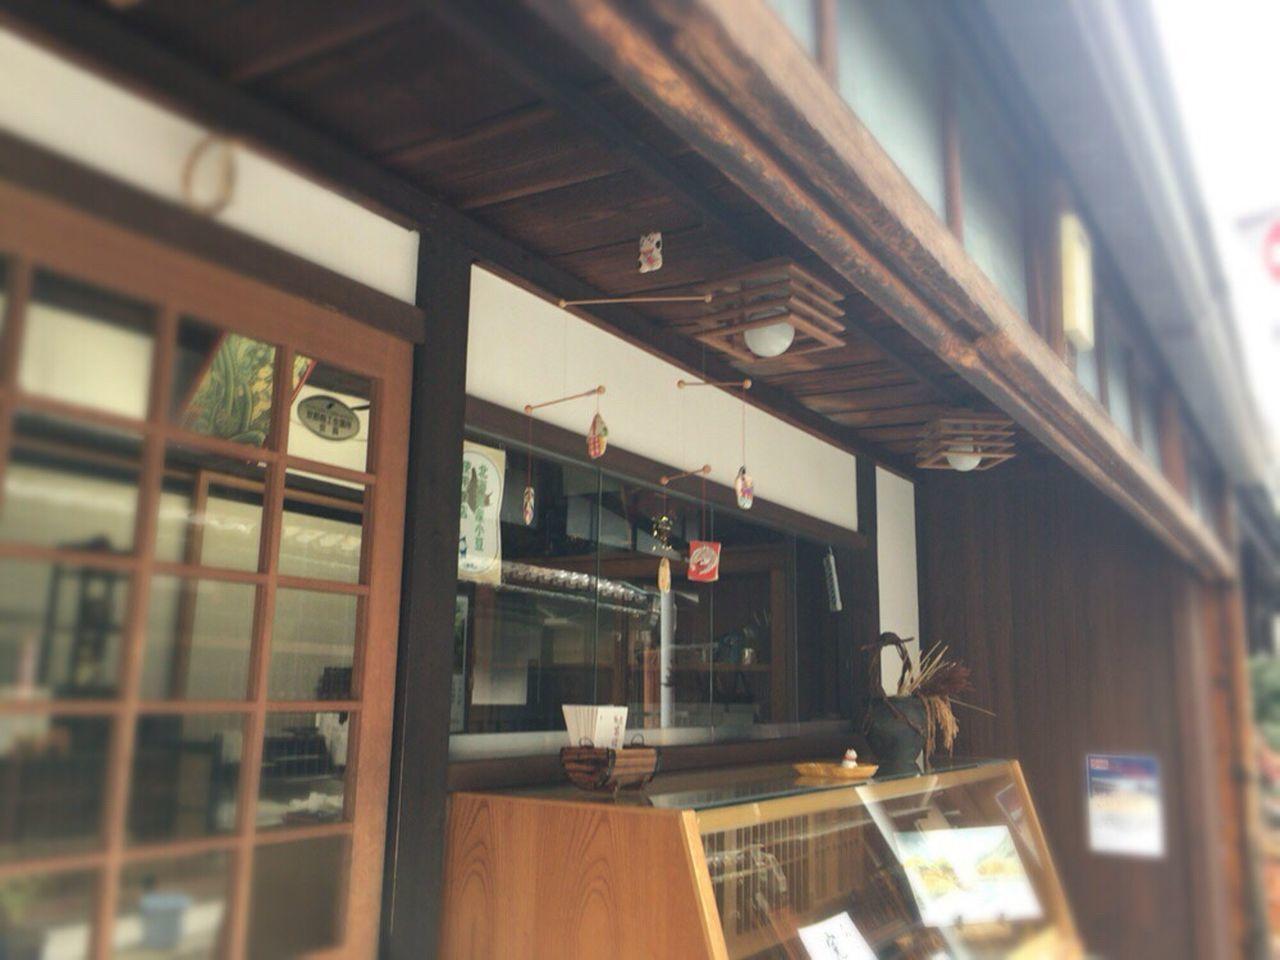 Kyoto Japan Kyoto City Kyoto Street Traditional Shop Kyoto Tradisional Shop Kyoto Tradisional